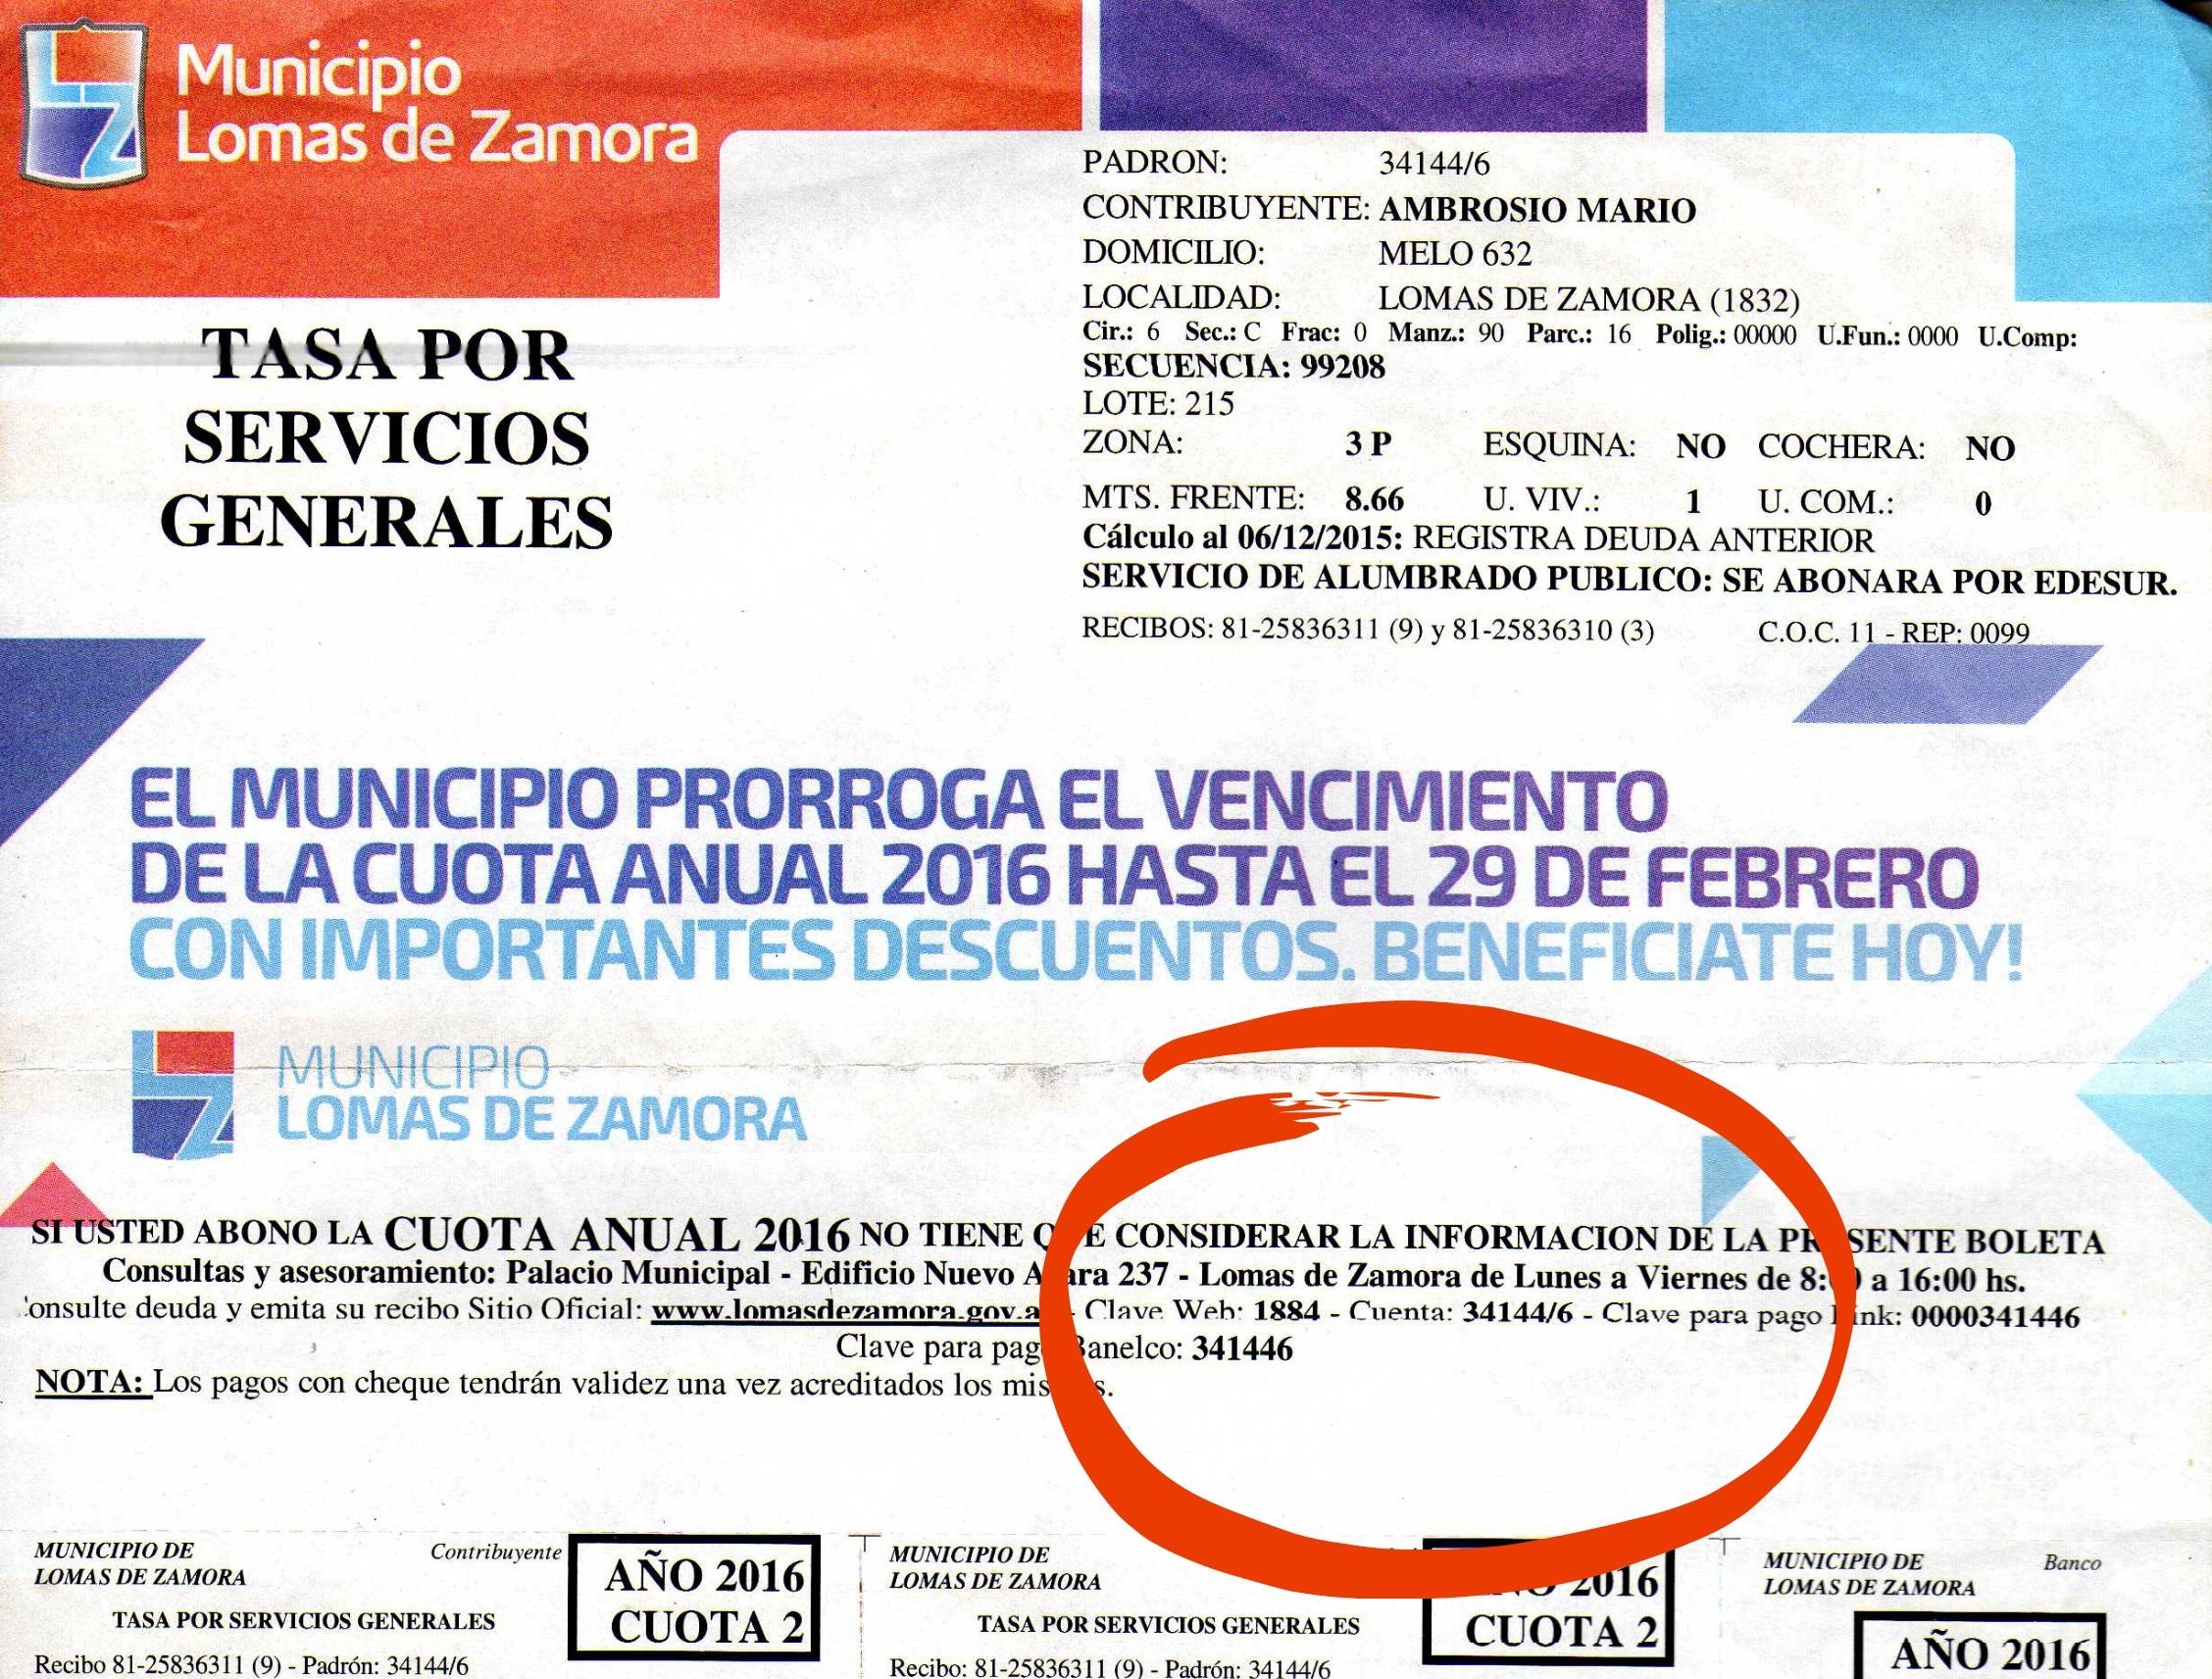 Guía de trámites Lomas de Zamora